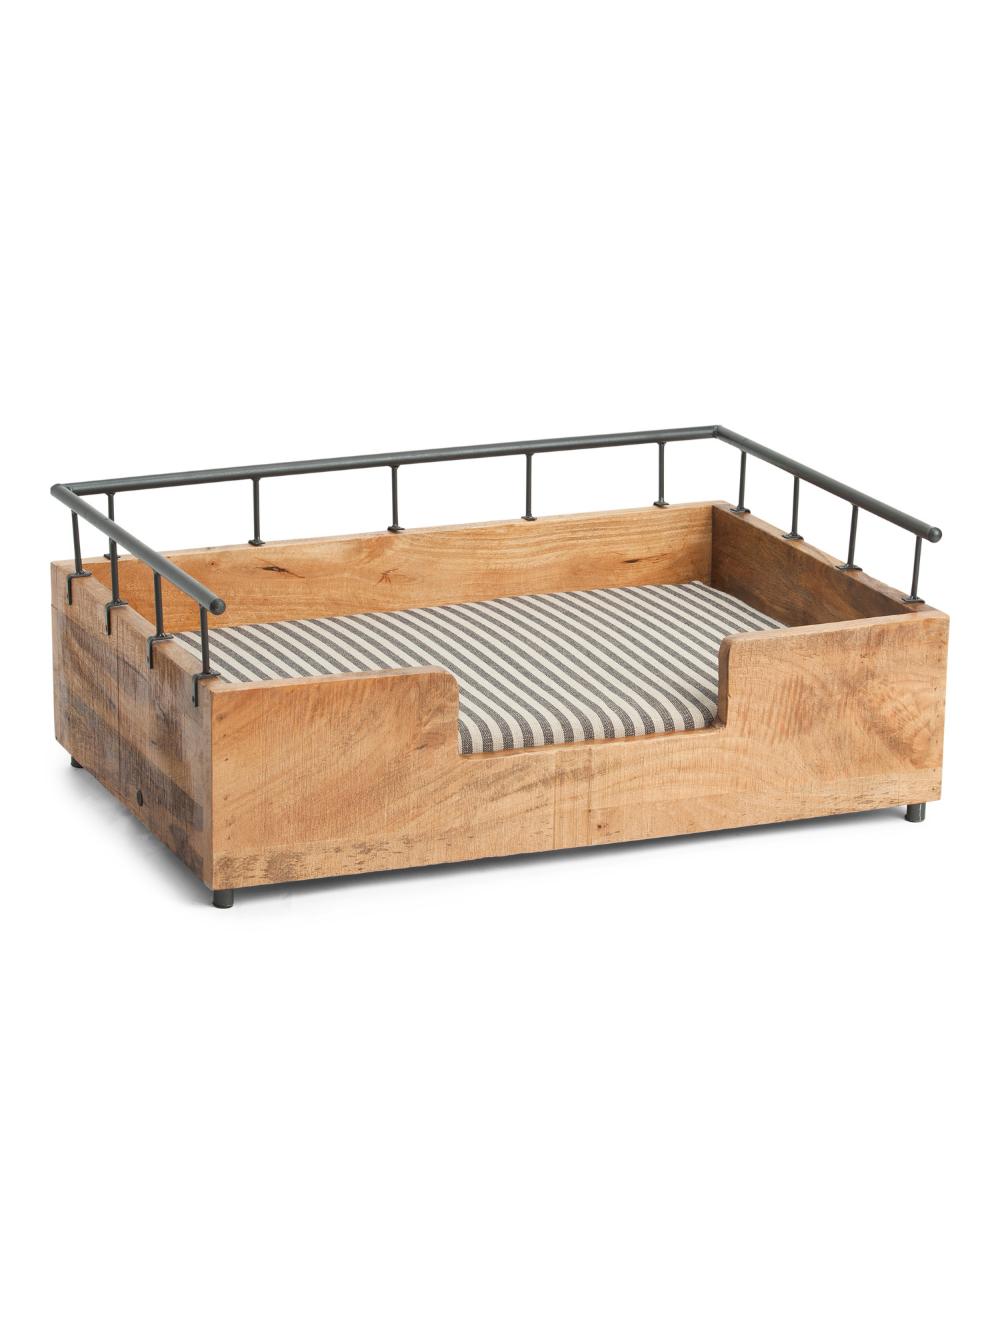 Made In India Medium Wooden Pet Bed Pet T.J.Maxx